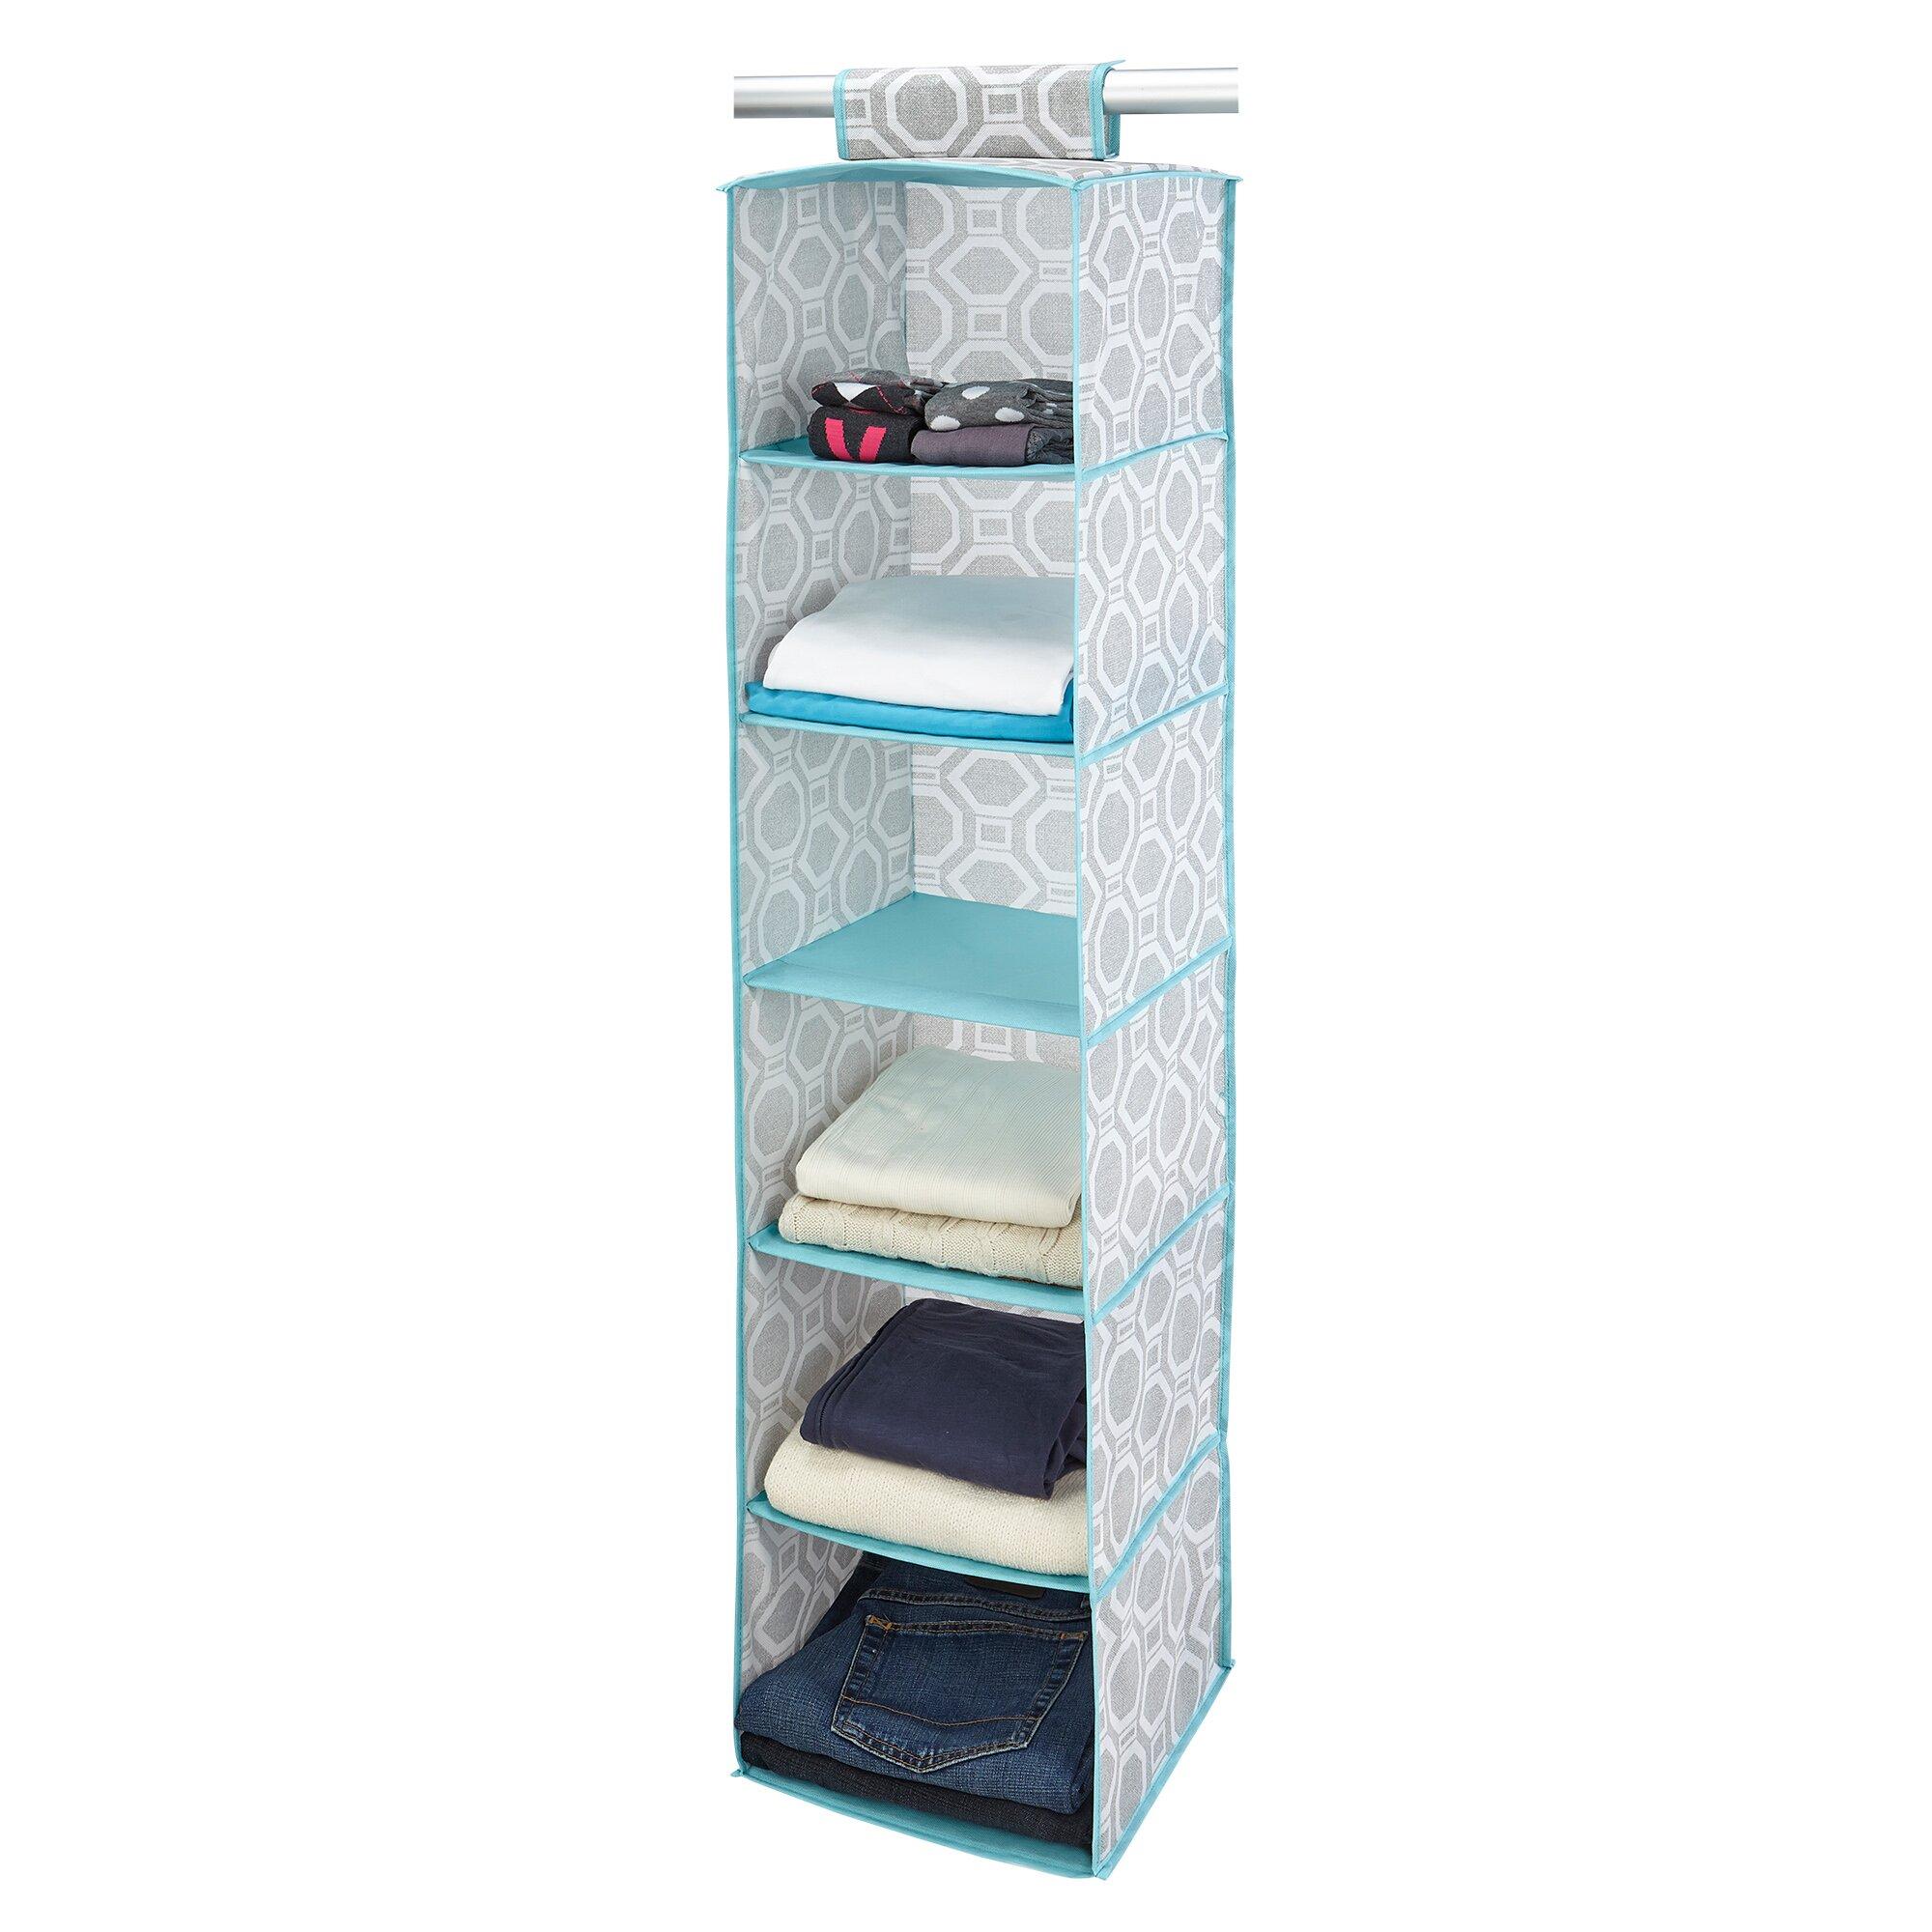 closet candie dove 6 shelf hanging organizer reviews. Black Bedroom Furniture Sets. Home Design Ideas